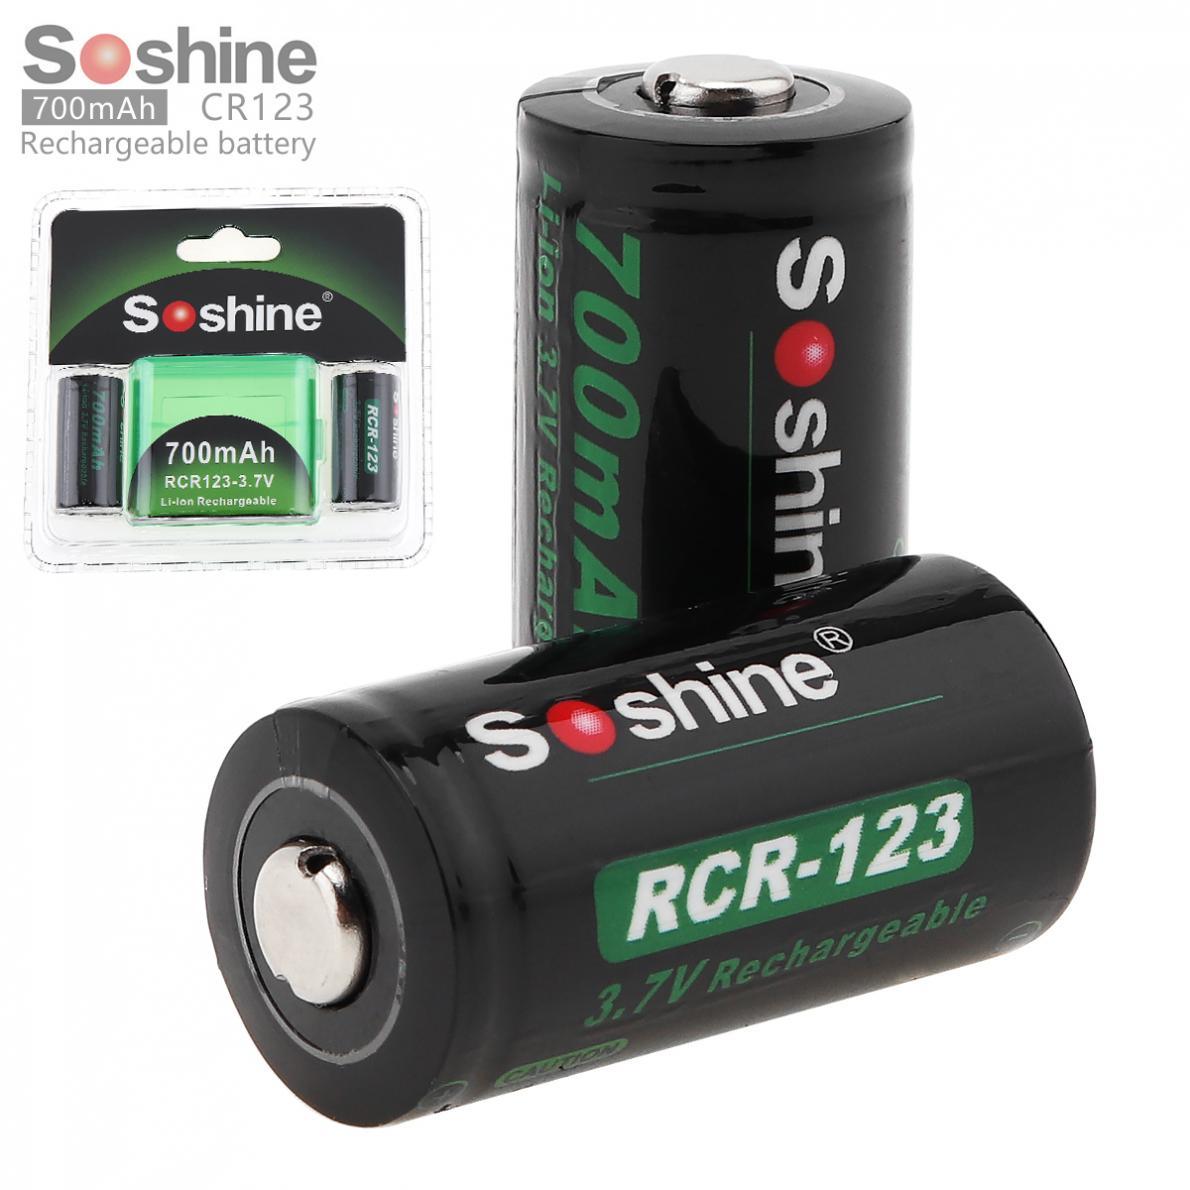 4pcs/set Soshine Li-ion RCR 123 16340 700mAh 3.7V Rechargeable Lithium Li-ion battria+2 Battery Case Storage Box цены онлайн